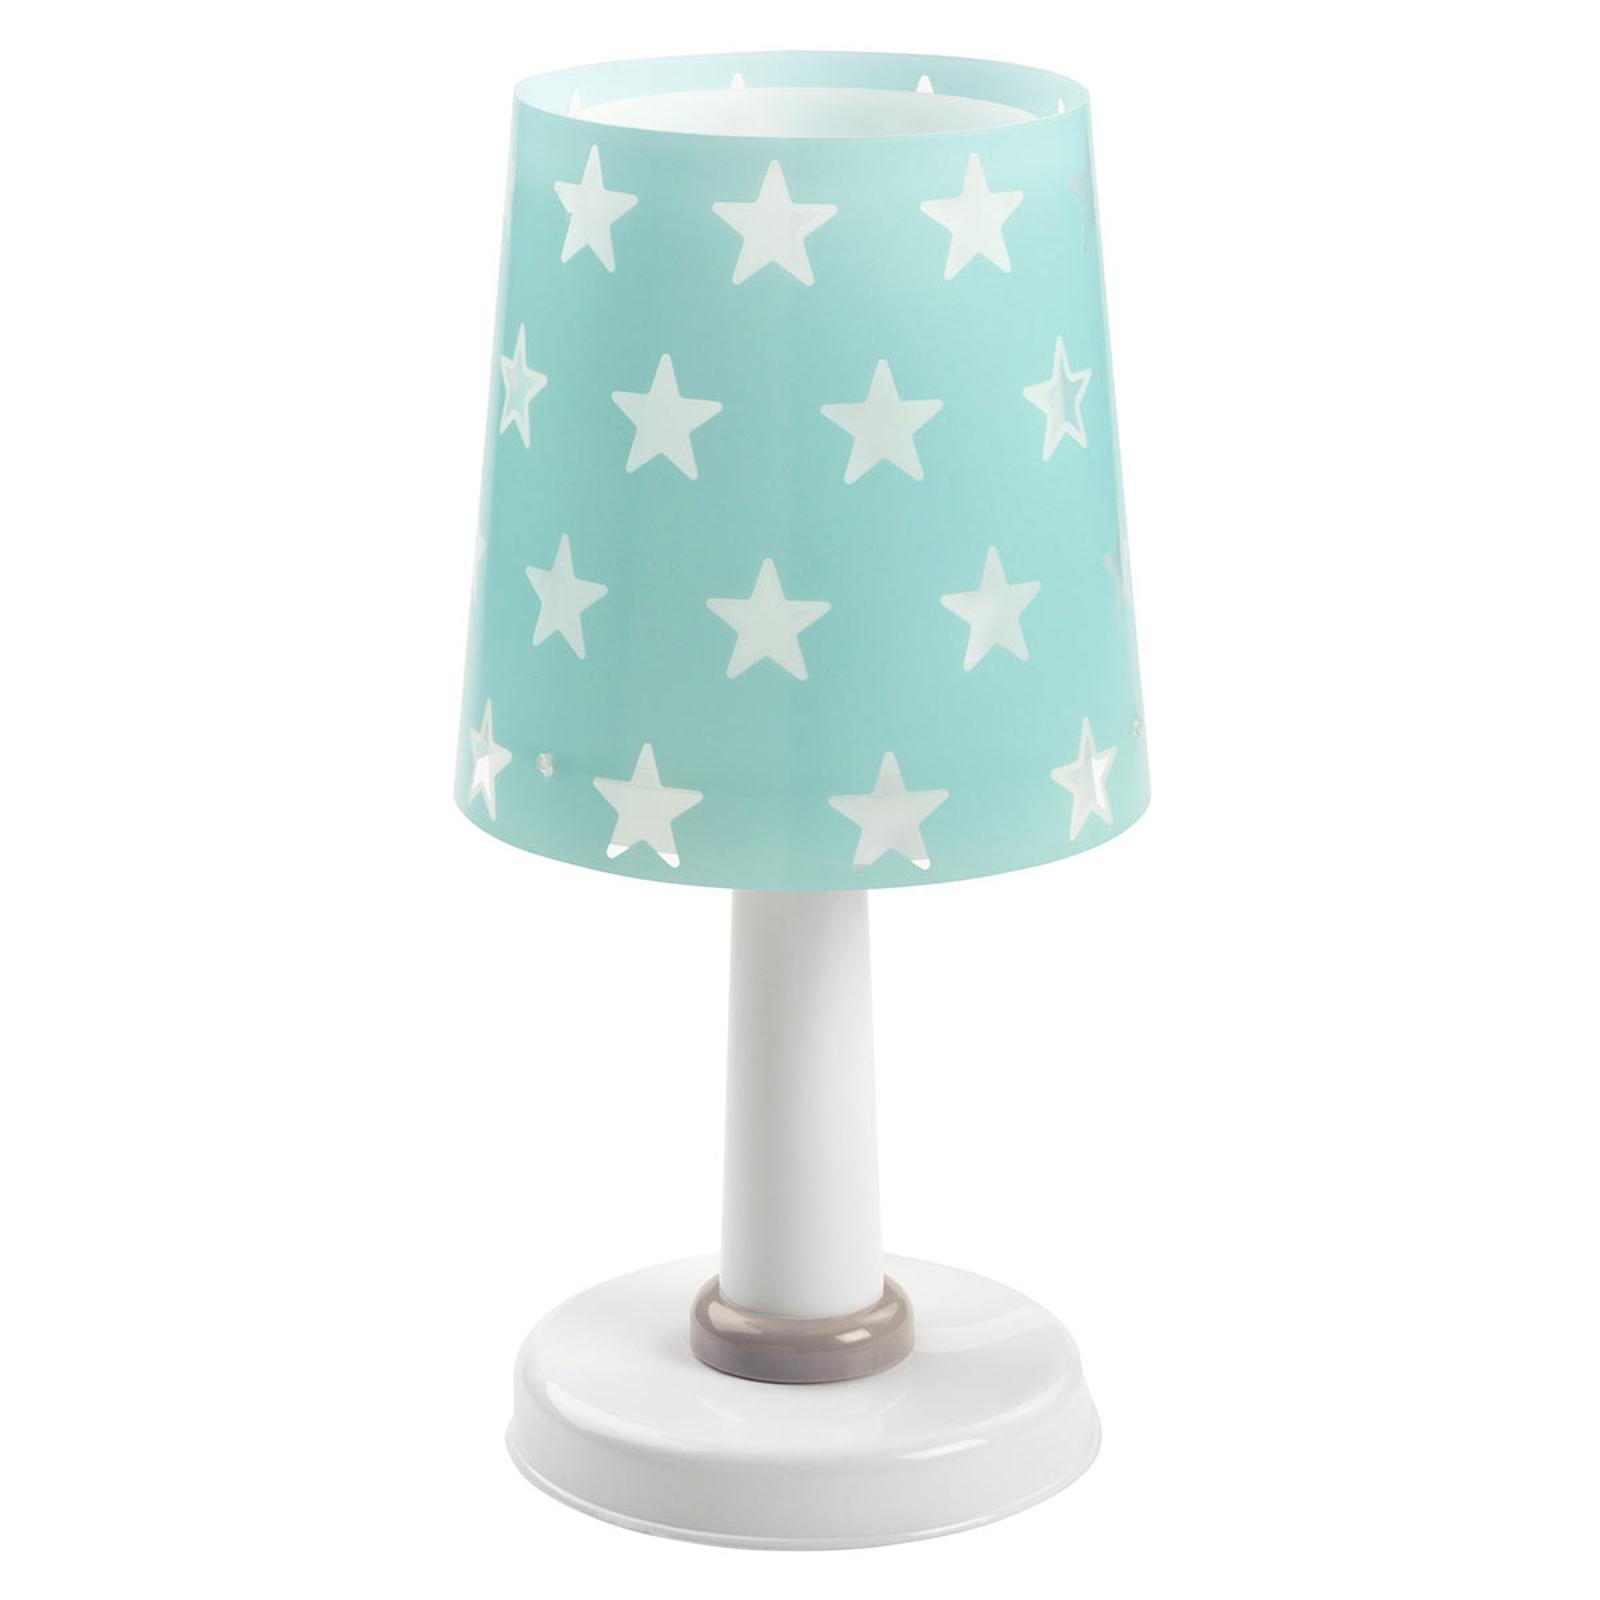 Turquoise-kleurige tafellamp Stars m. lichteffect